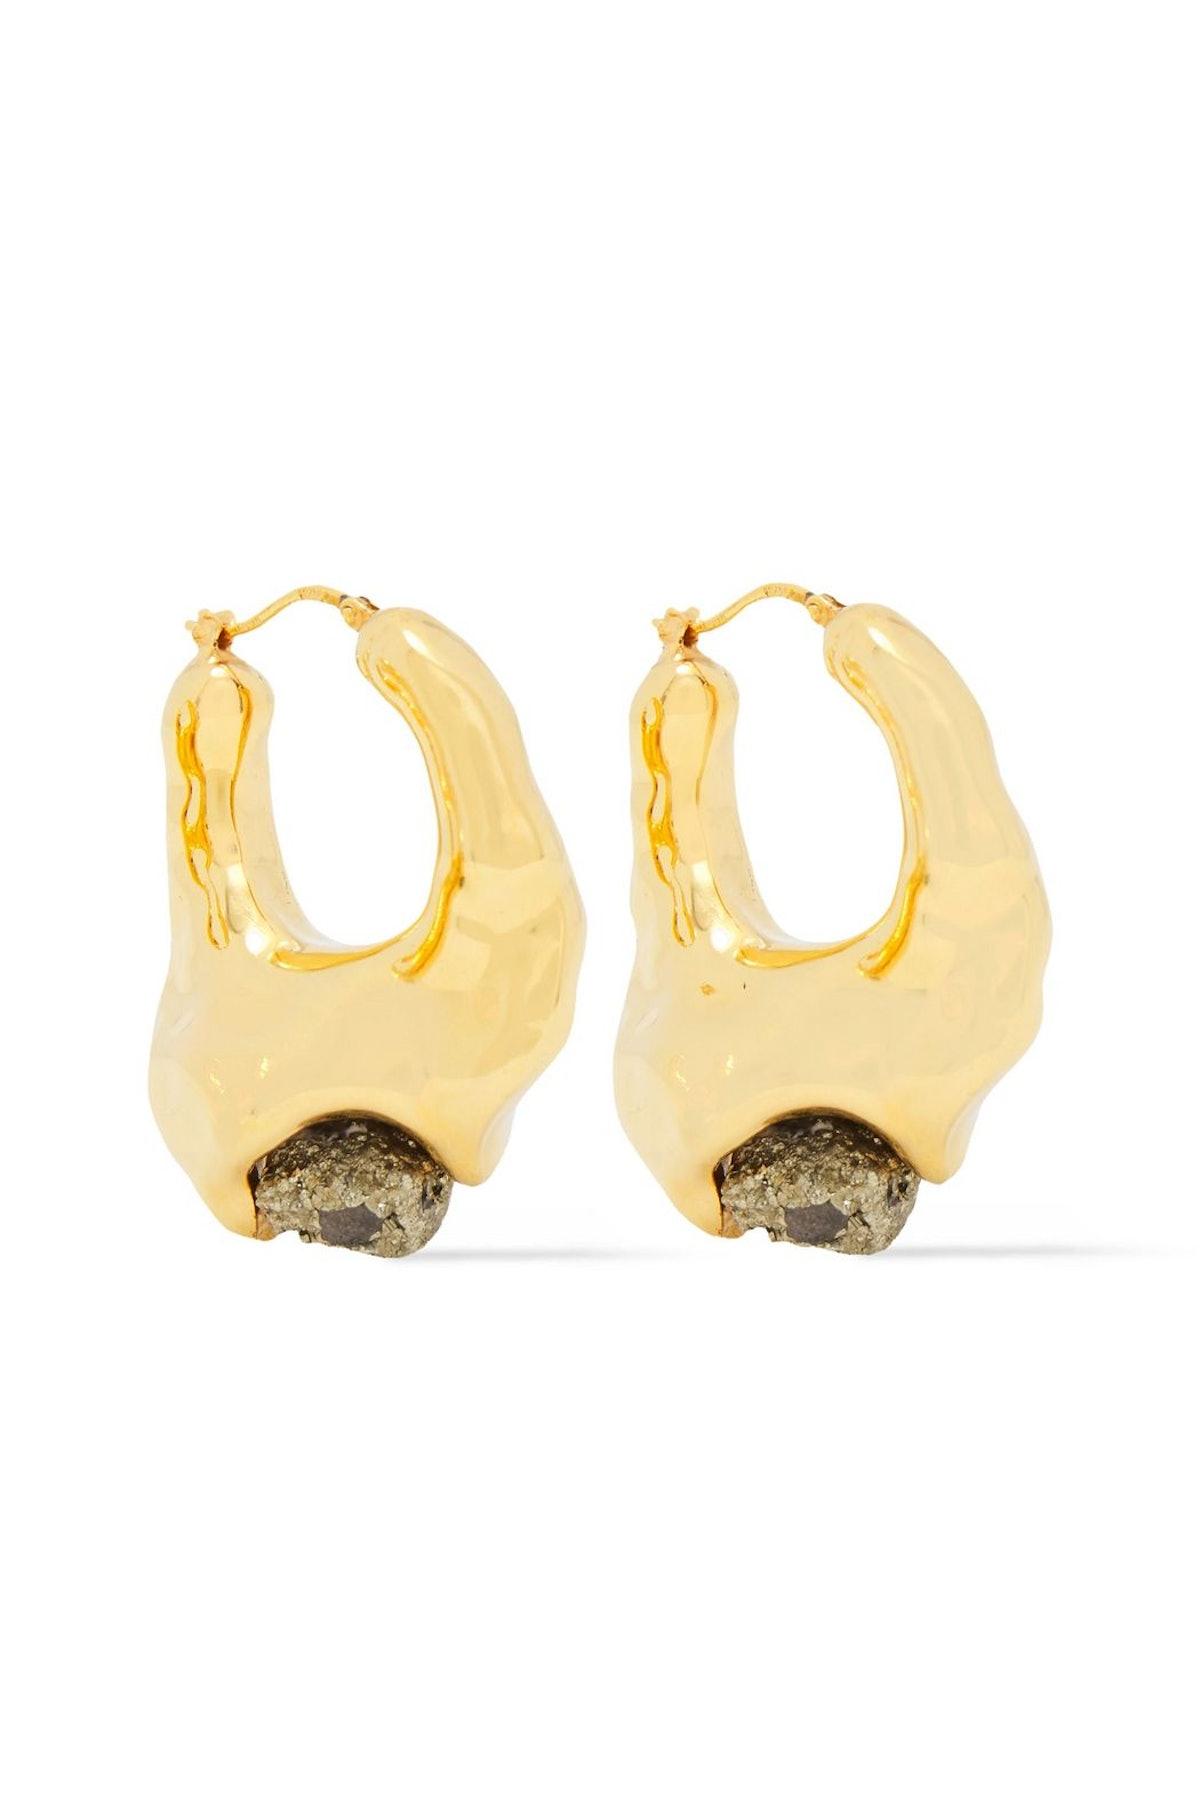 Marni Gold-Tone Pyrite Earrings